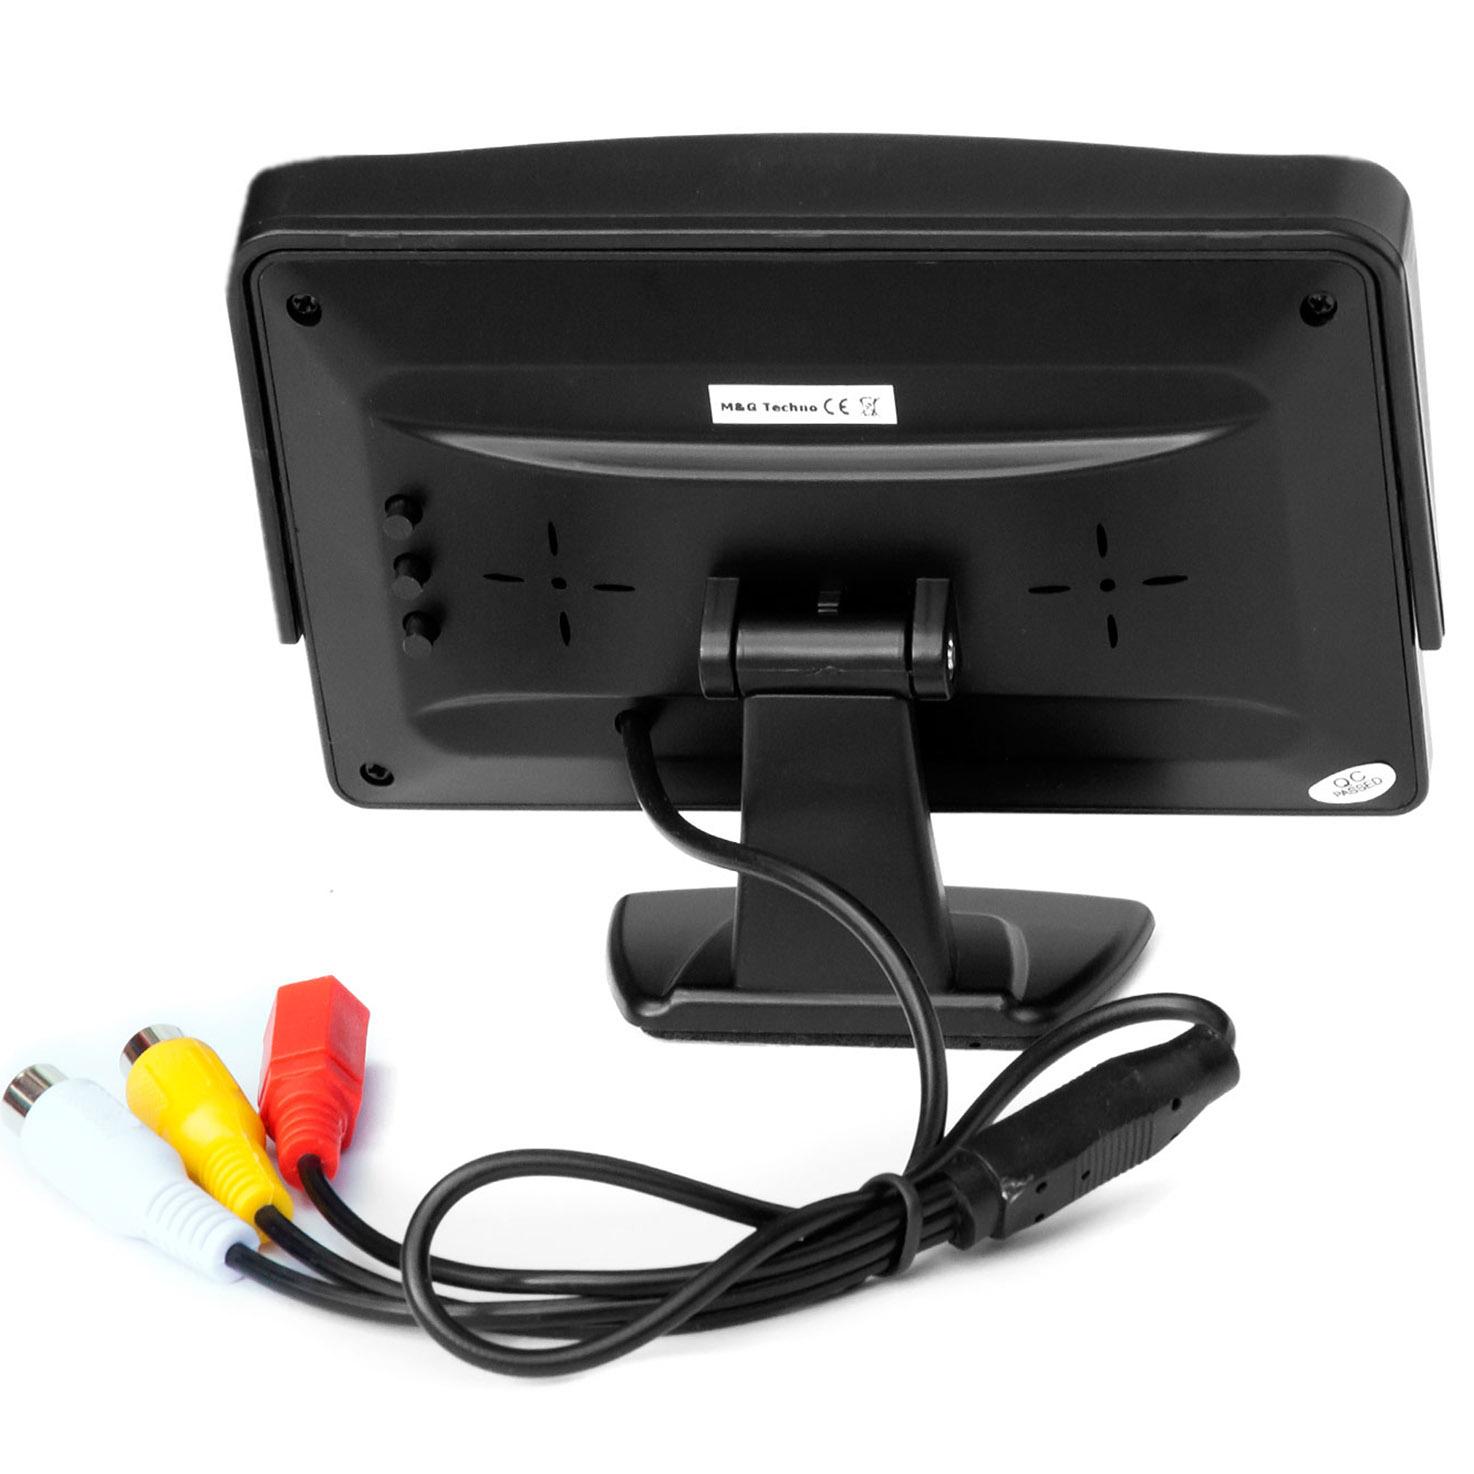 auto standfu lcd tft bildschirm monitor 5 zoll f r r ckfahrkamera ebay. Black Bedroom Furniture Sets. Home Design Ideas